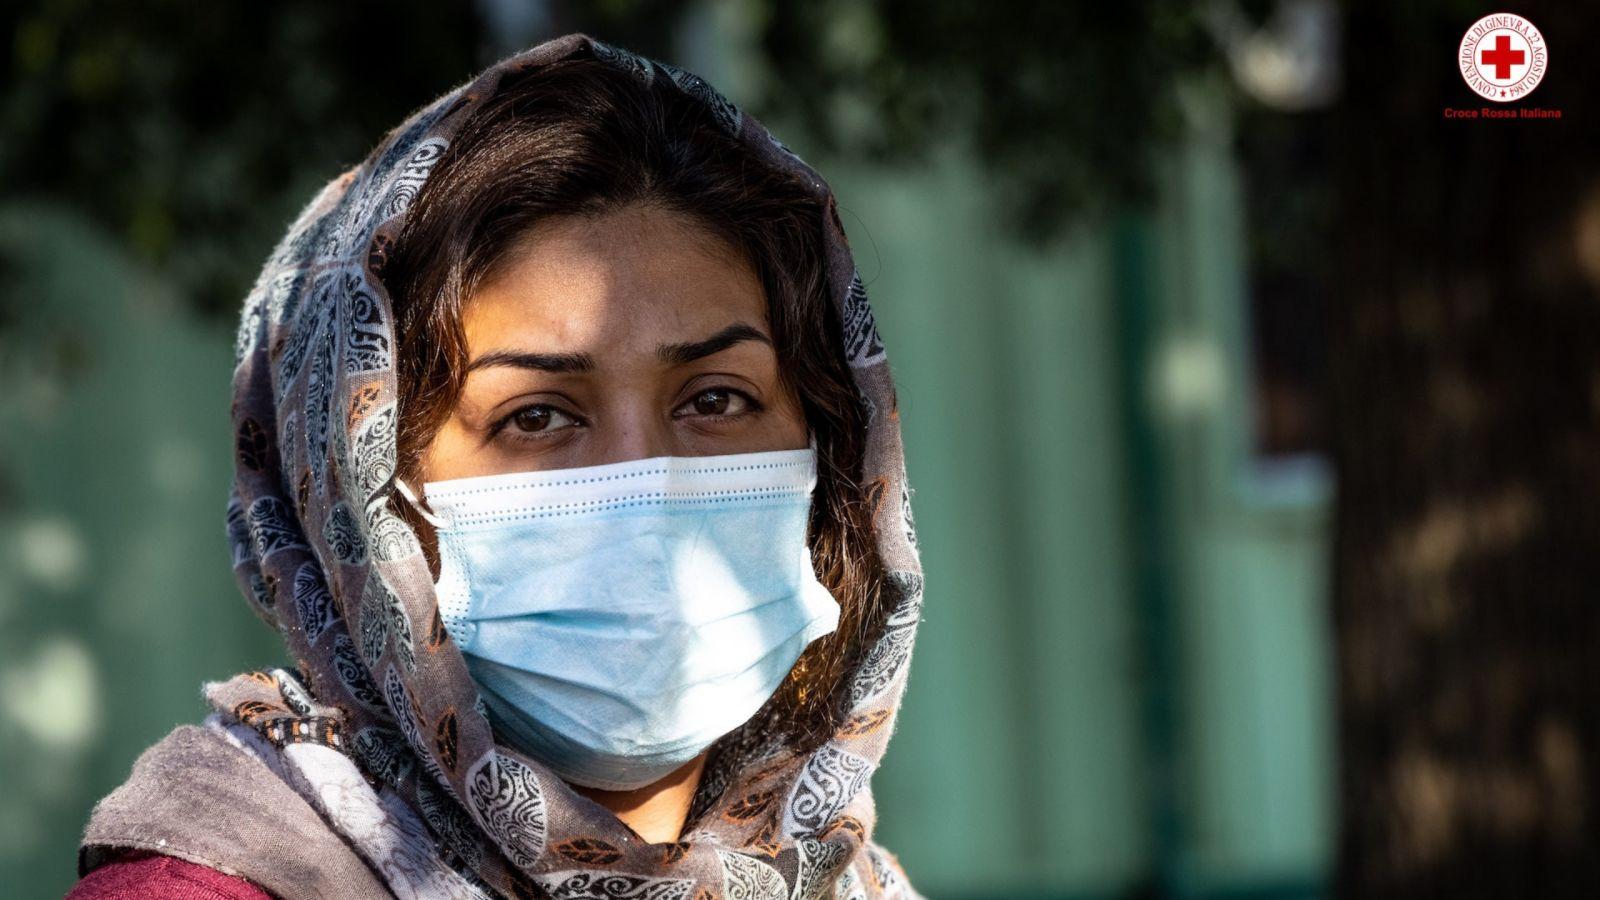 Afghanistan, Nazila e le altre in Italia: «Le nostre vite sospese»